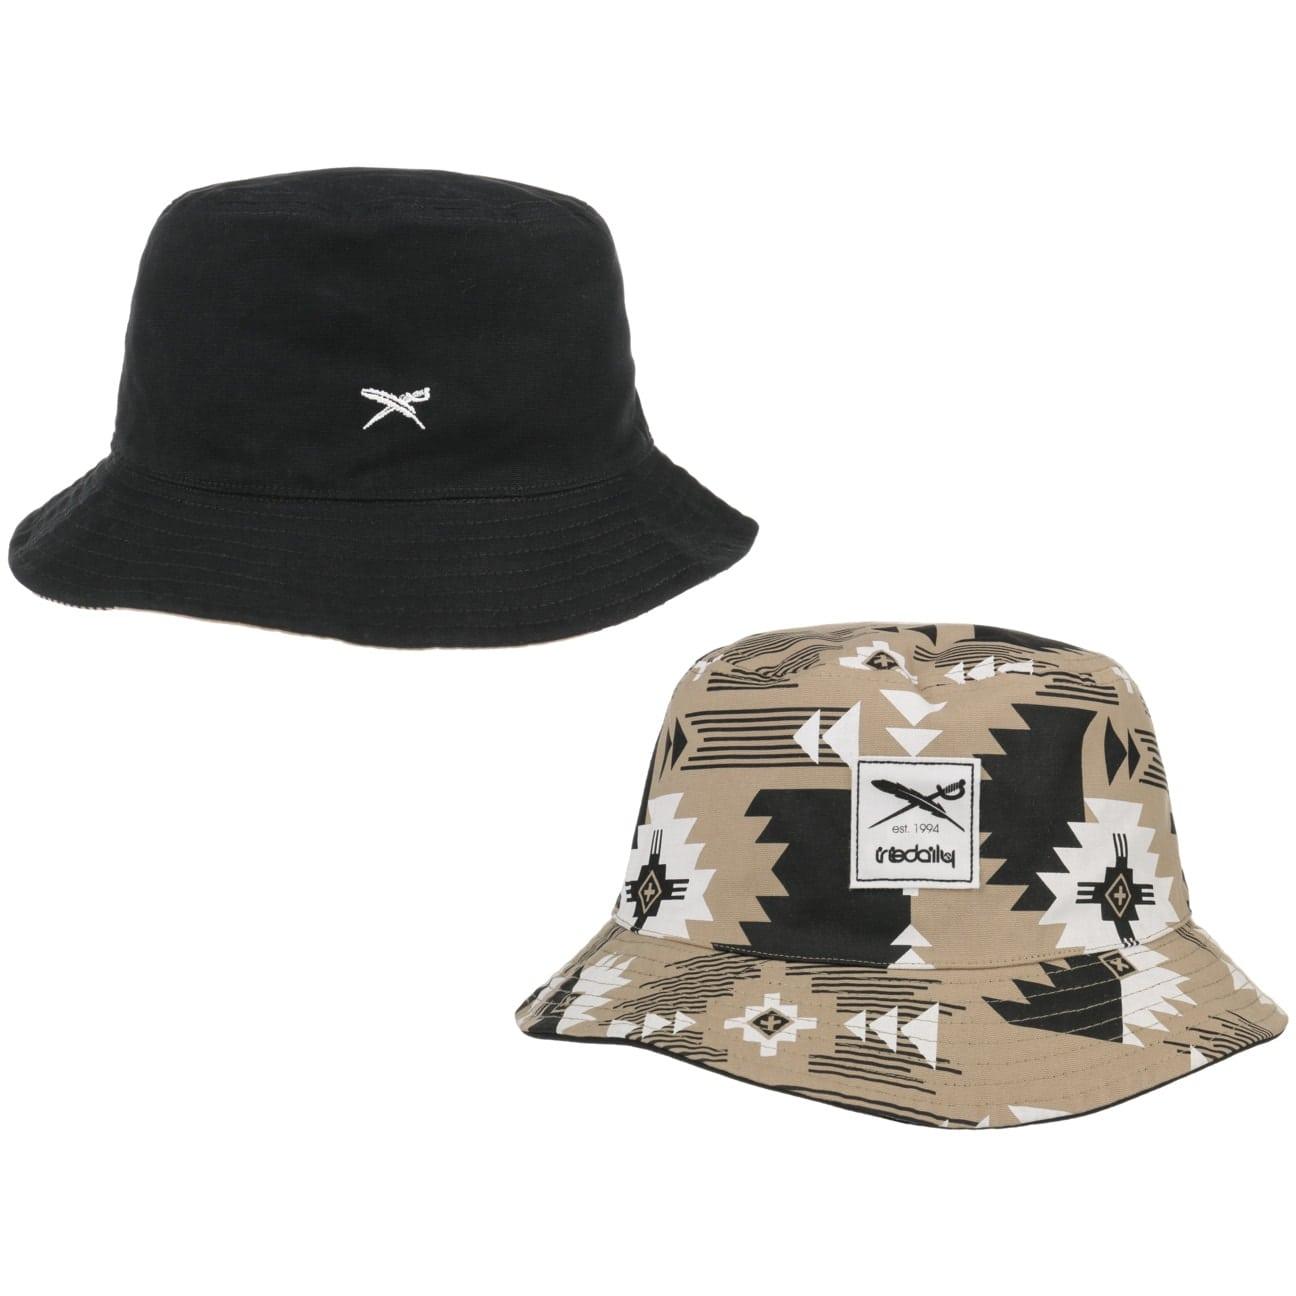 Chapeau Réversible Nomado Bucket by iriedaily  chapeau en tissu